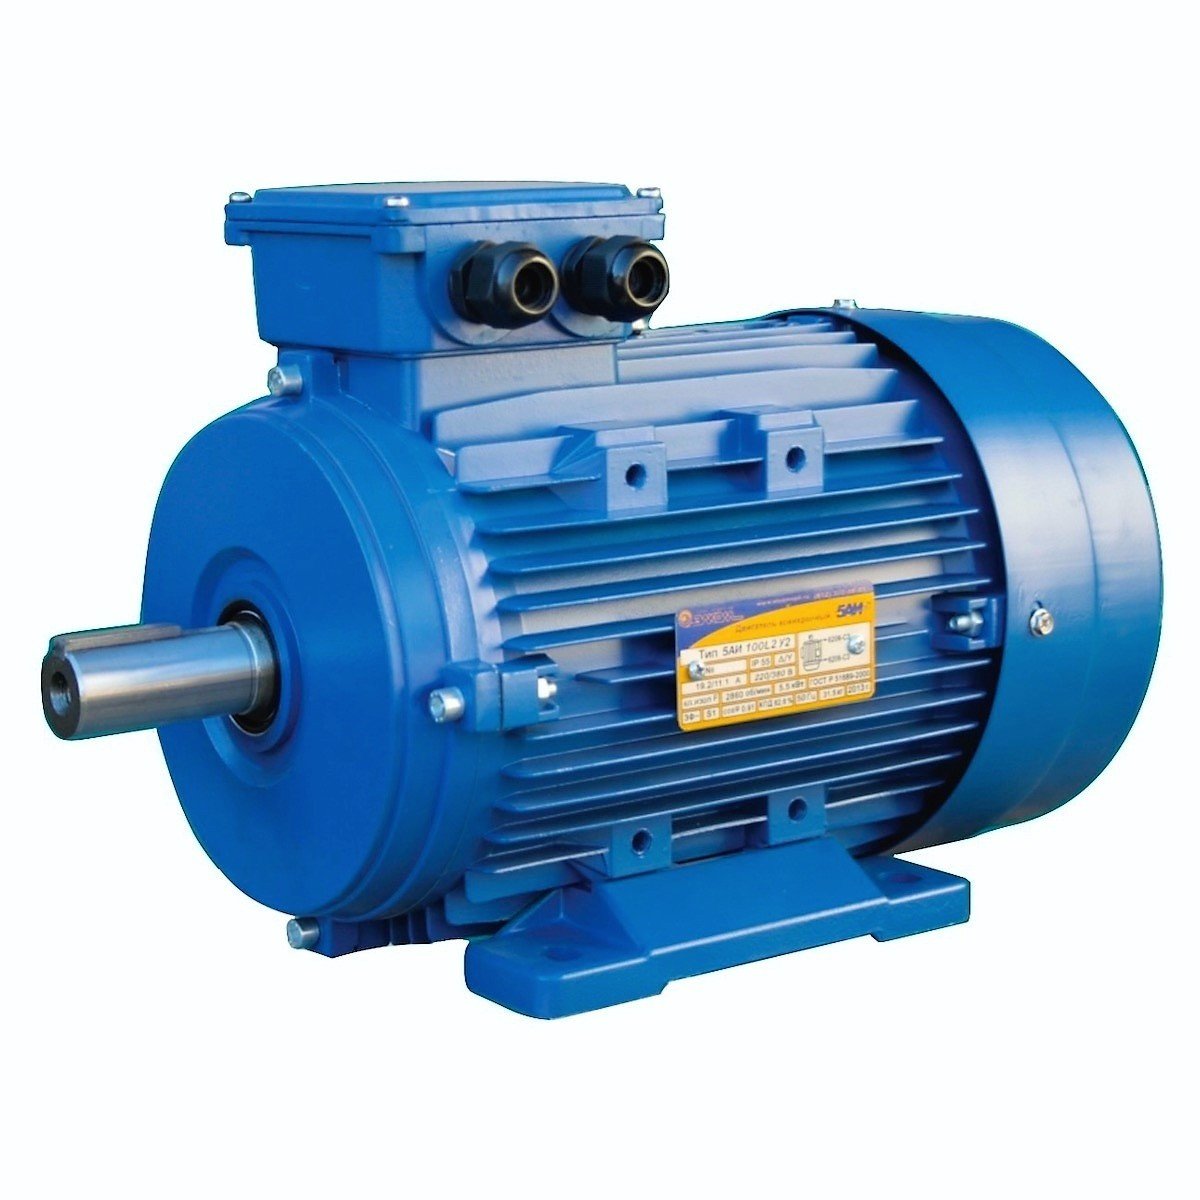 Эл/двигатель 5АИ  100 L6 2,2/1000 1081